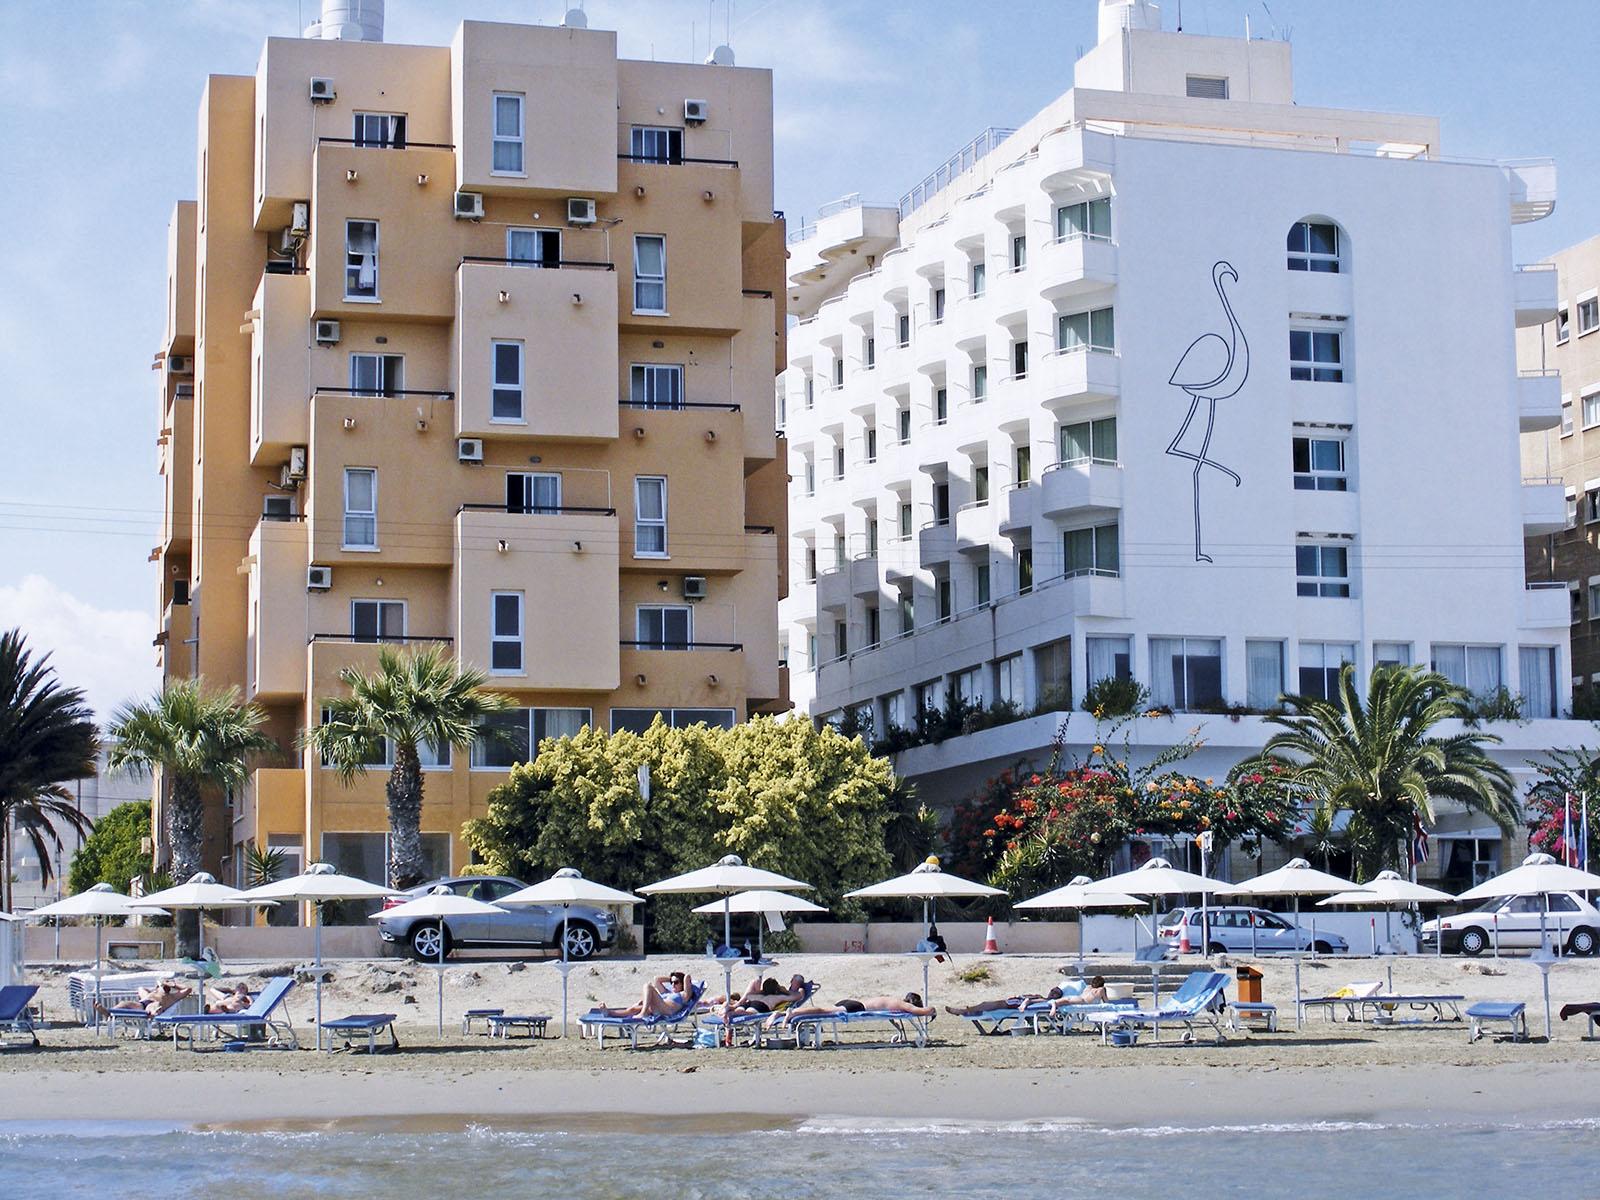 Ciprus 2019-2020 tél/tavasz - Budapesti indulás - Flamingo Beach Hotel